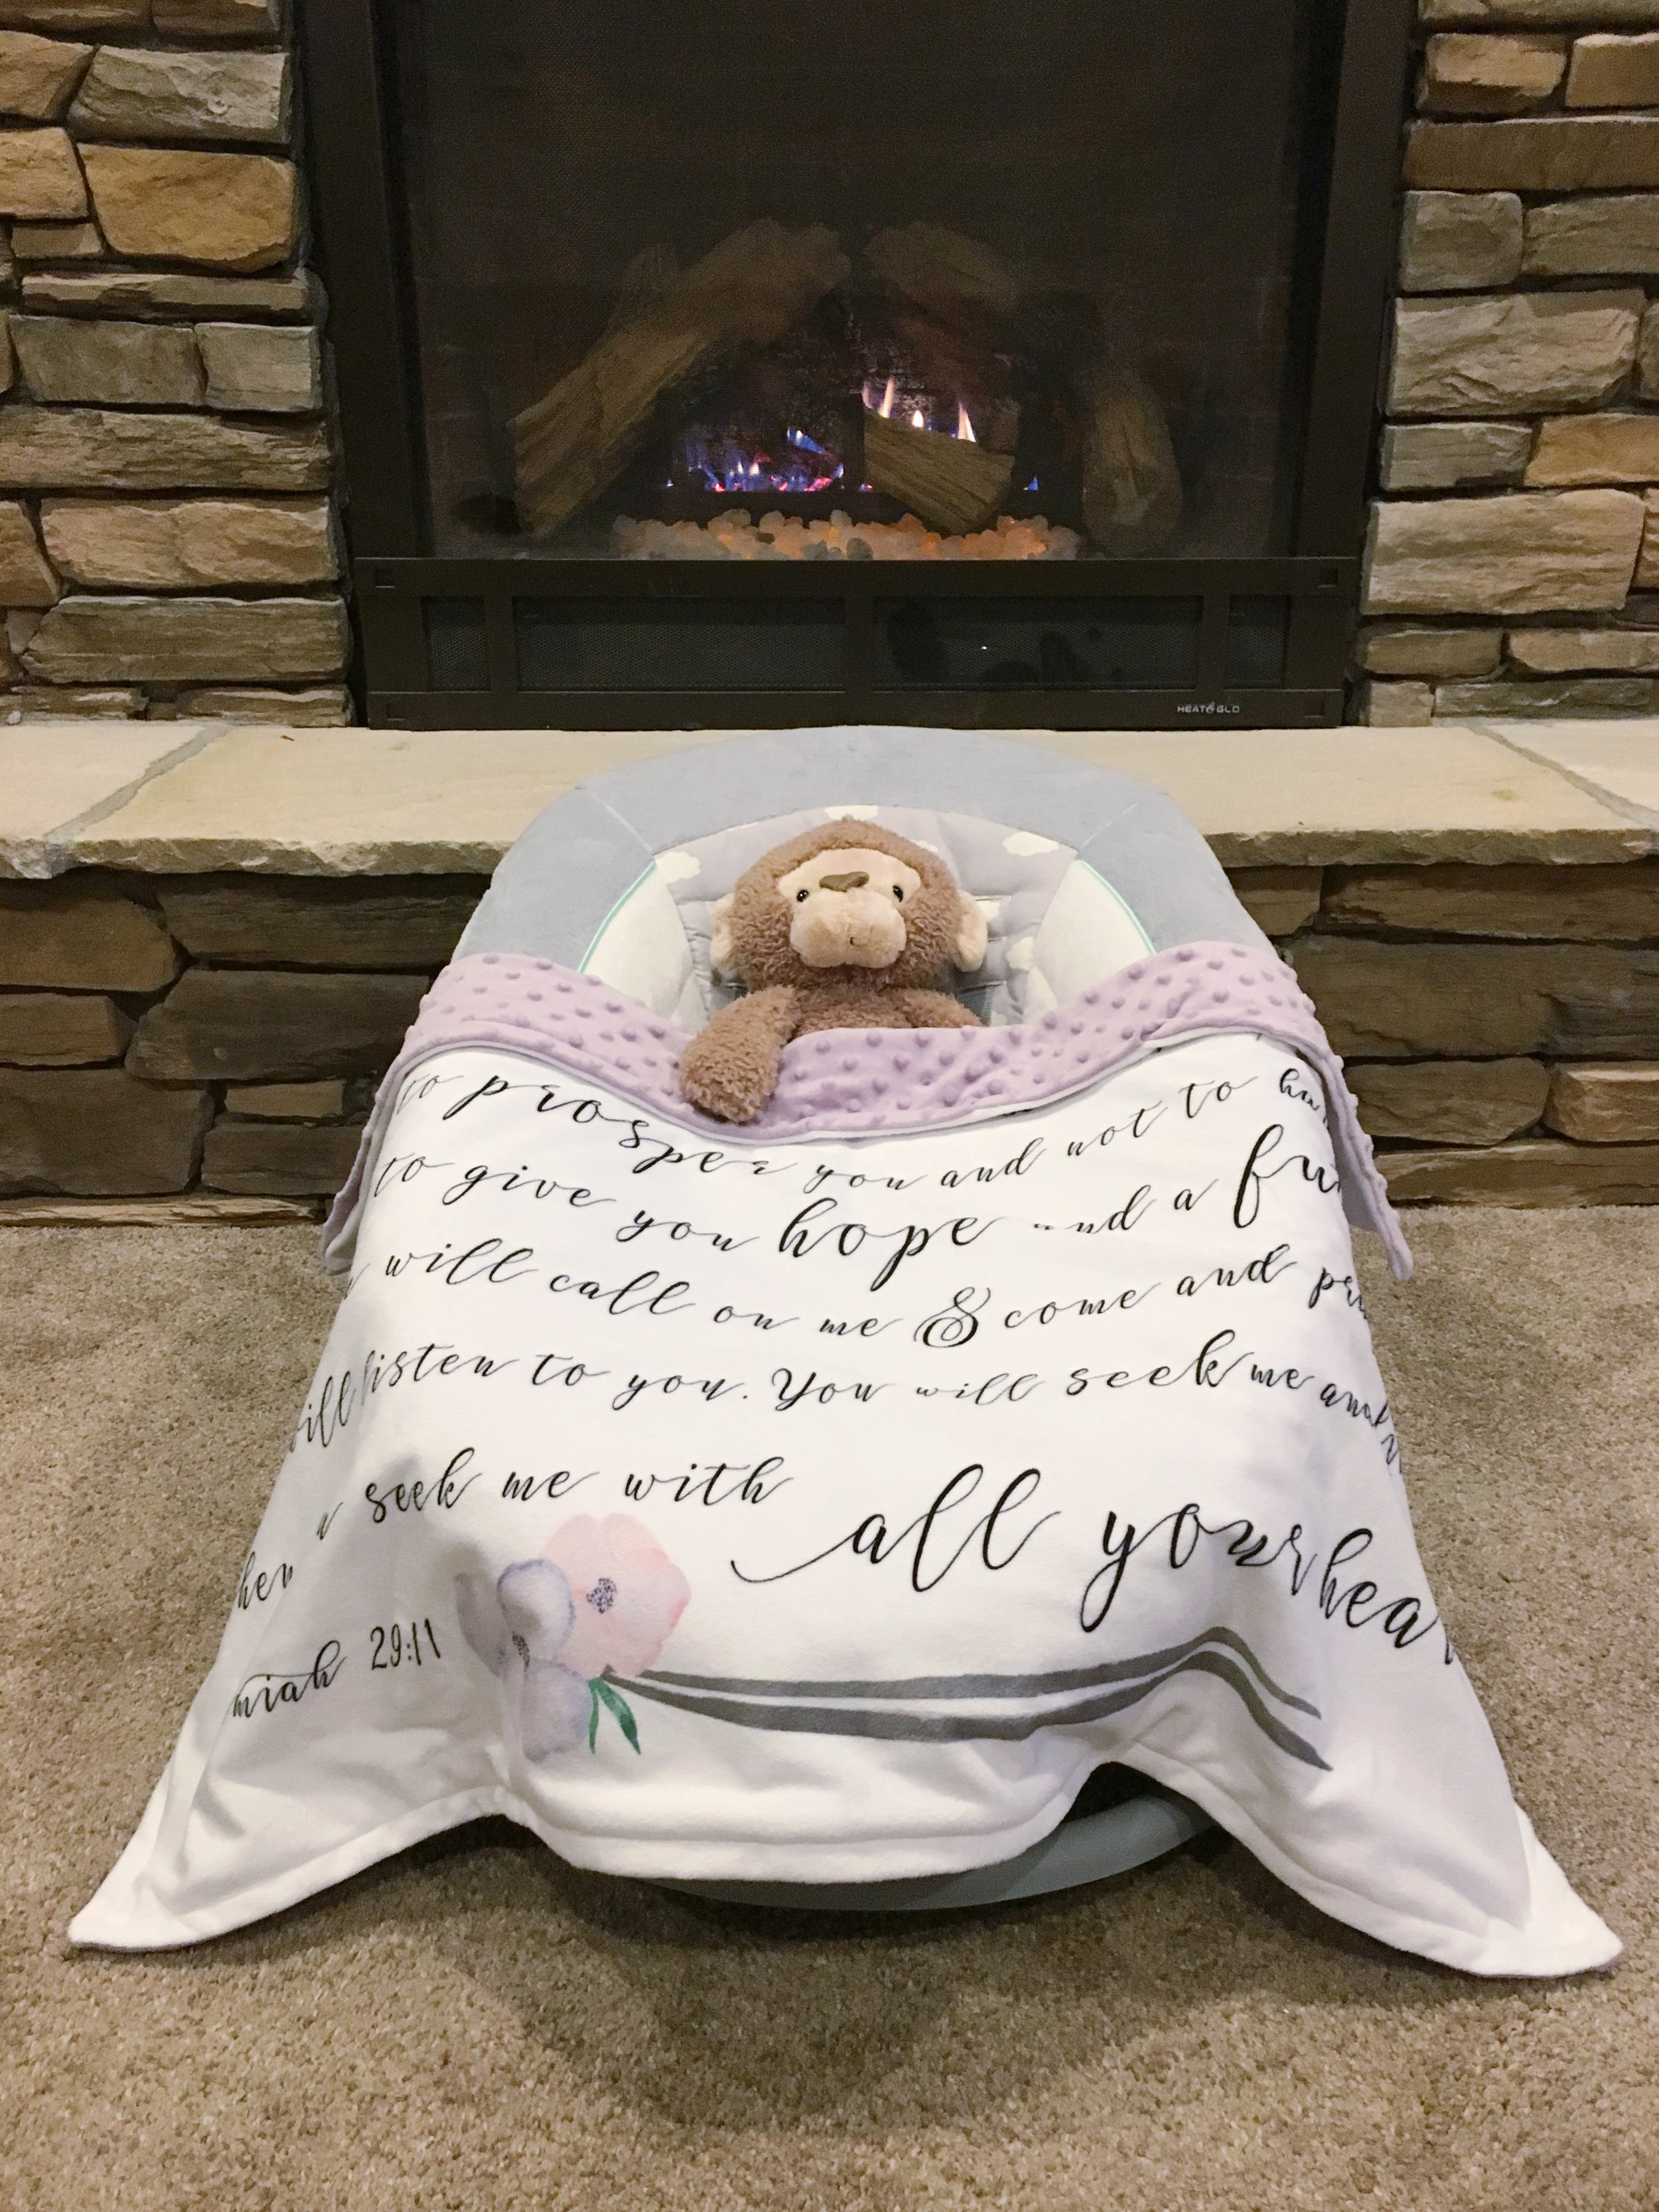 Central PA, Baby Blanket, Hand lettered, JesSmith Designs, Invitations, custom-04-15 06.25.21.jpg